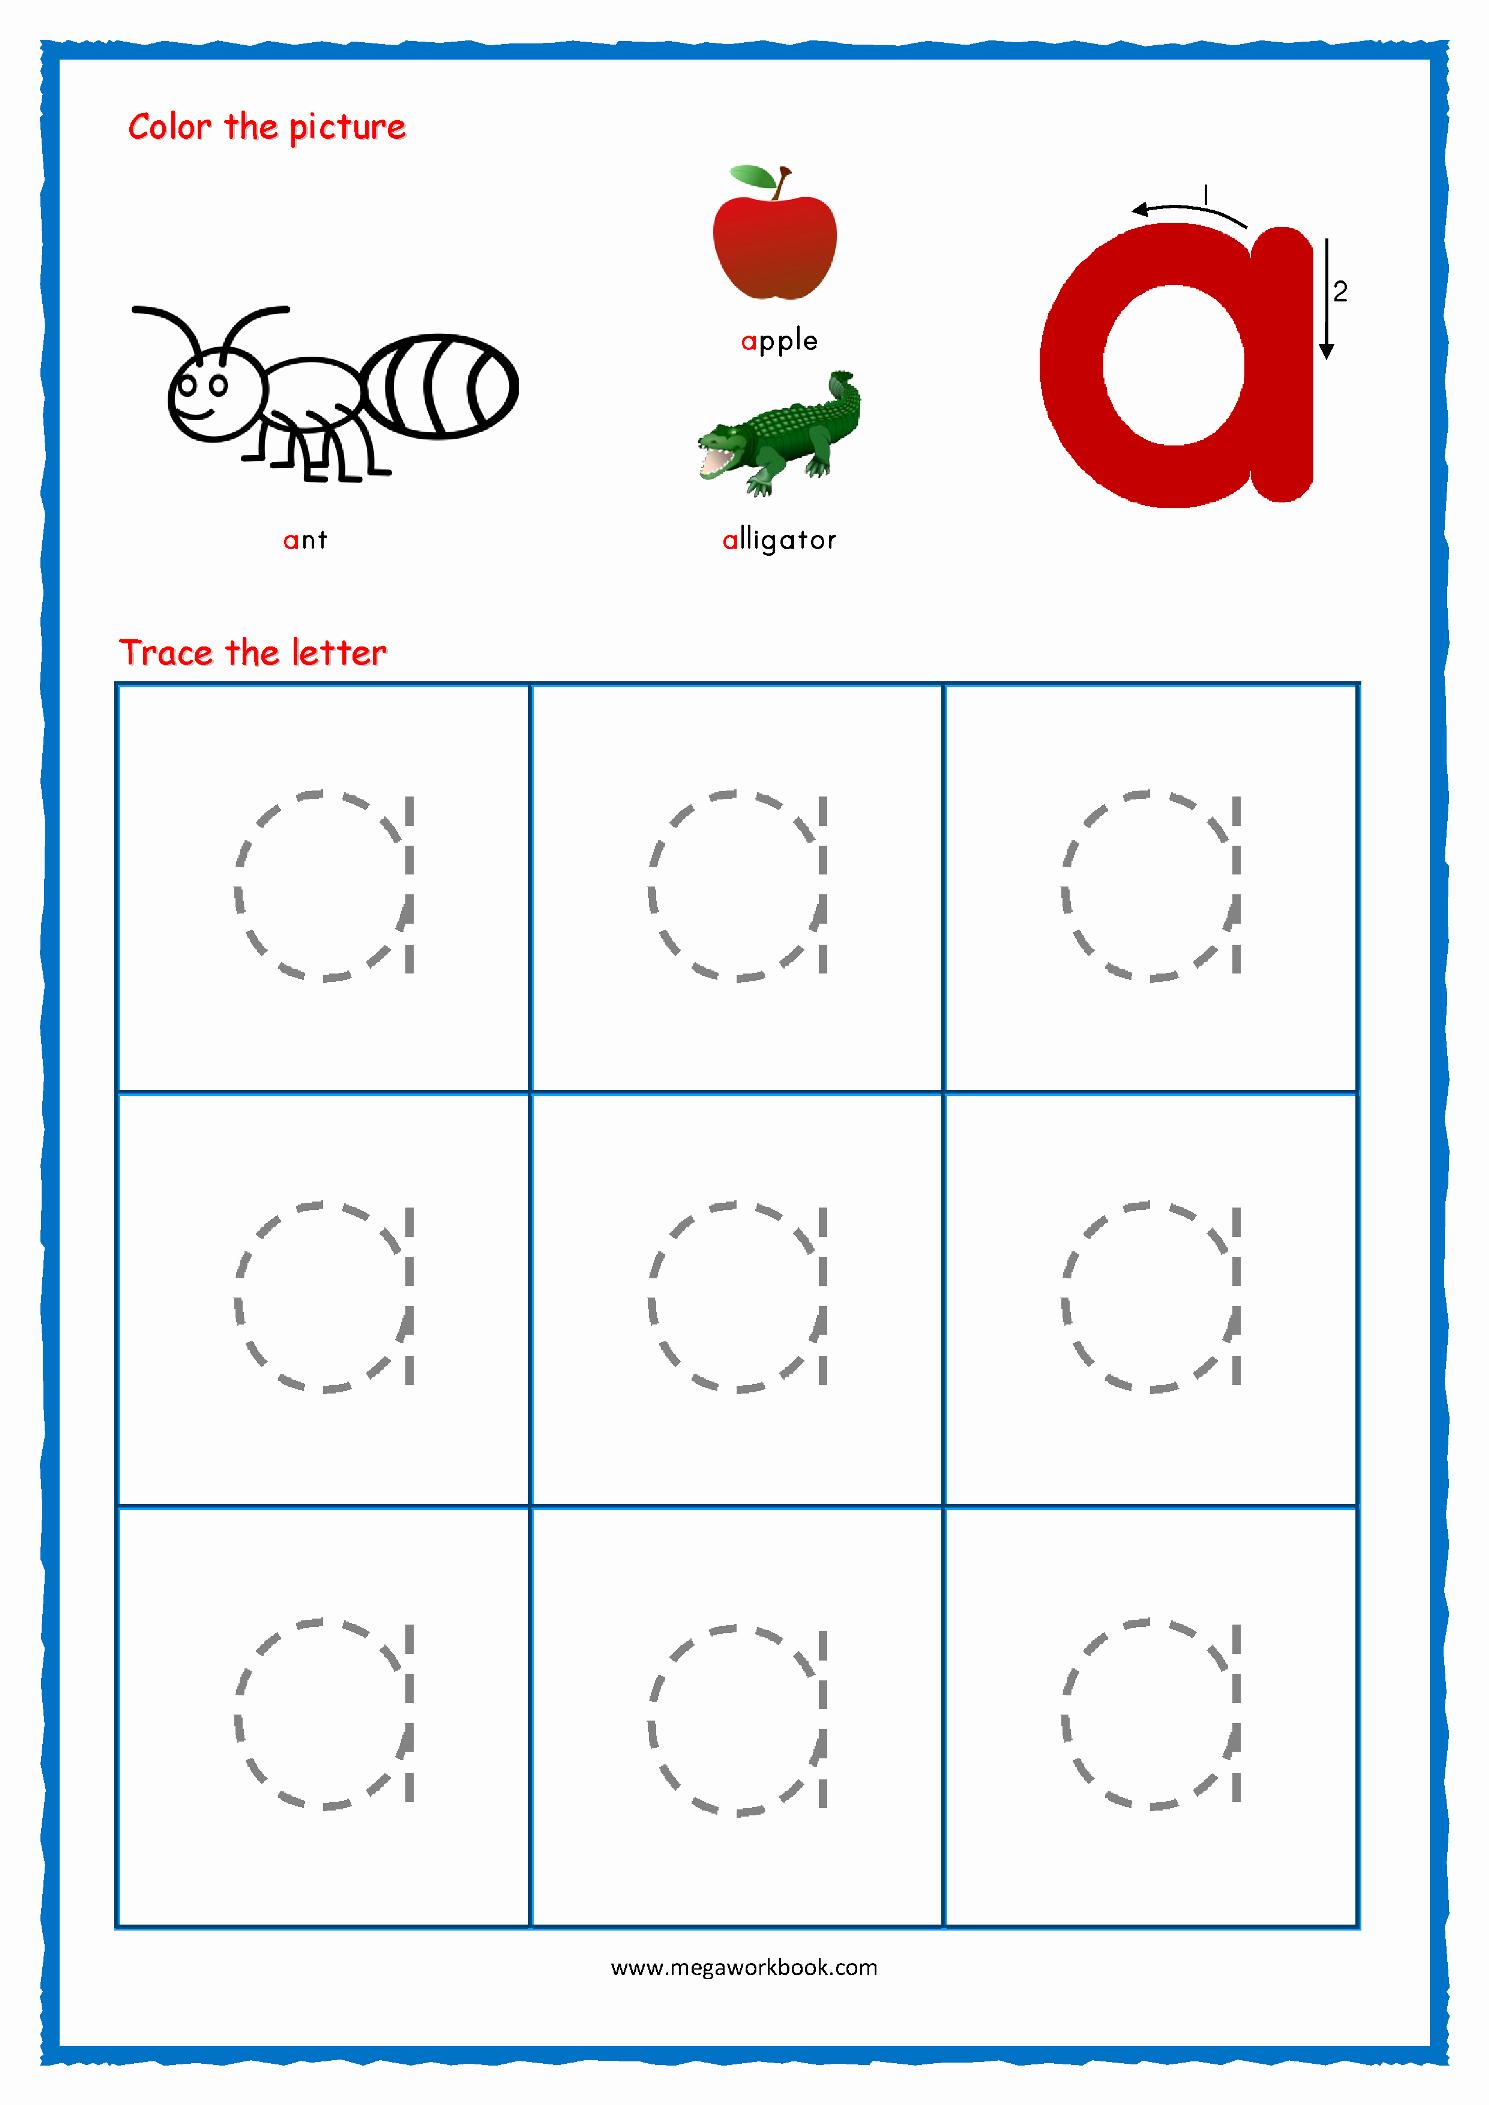 Kindergarten Lowercase Letters Worksheets Beautiful Lowercase Letters Tracing Worksheets Pdf